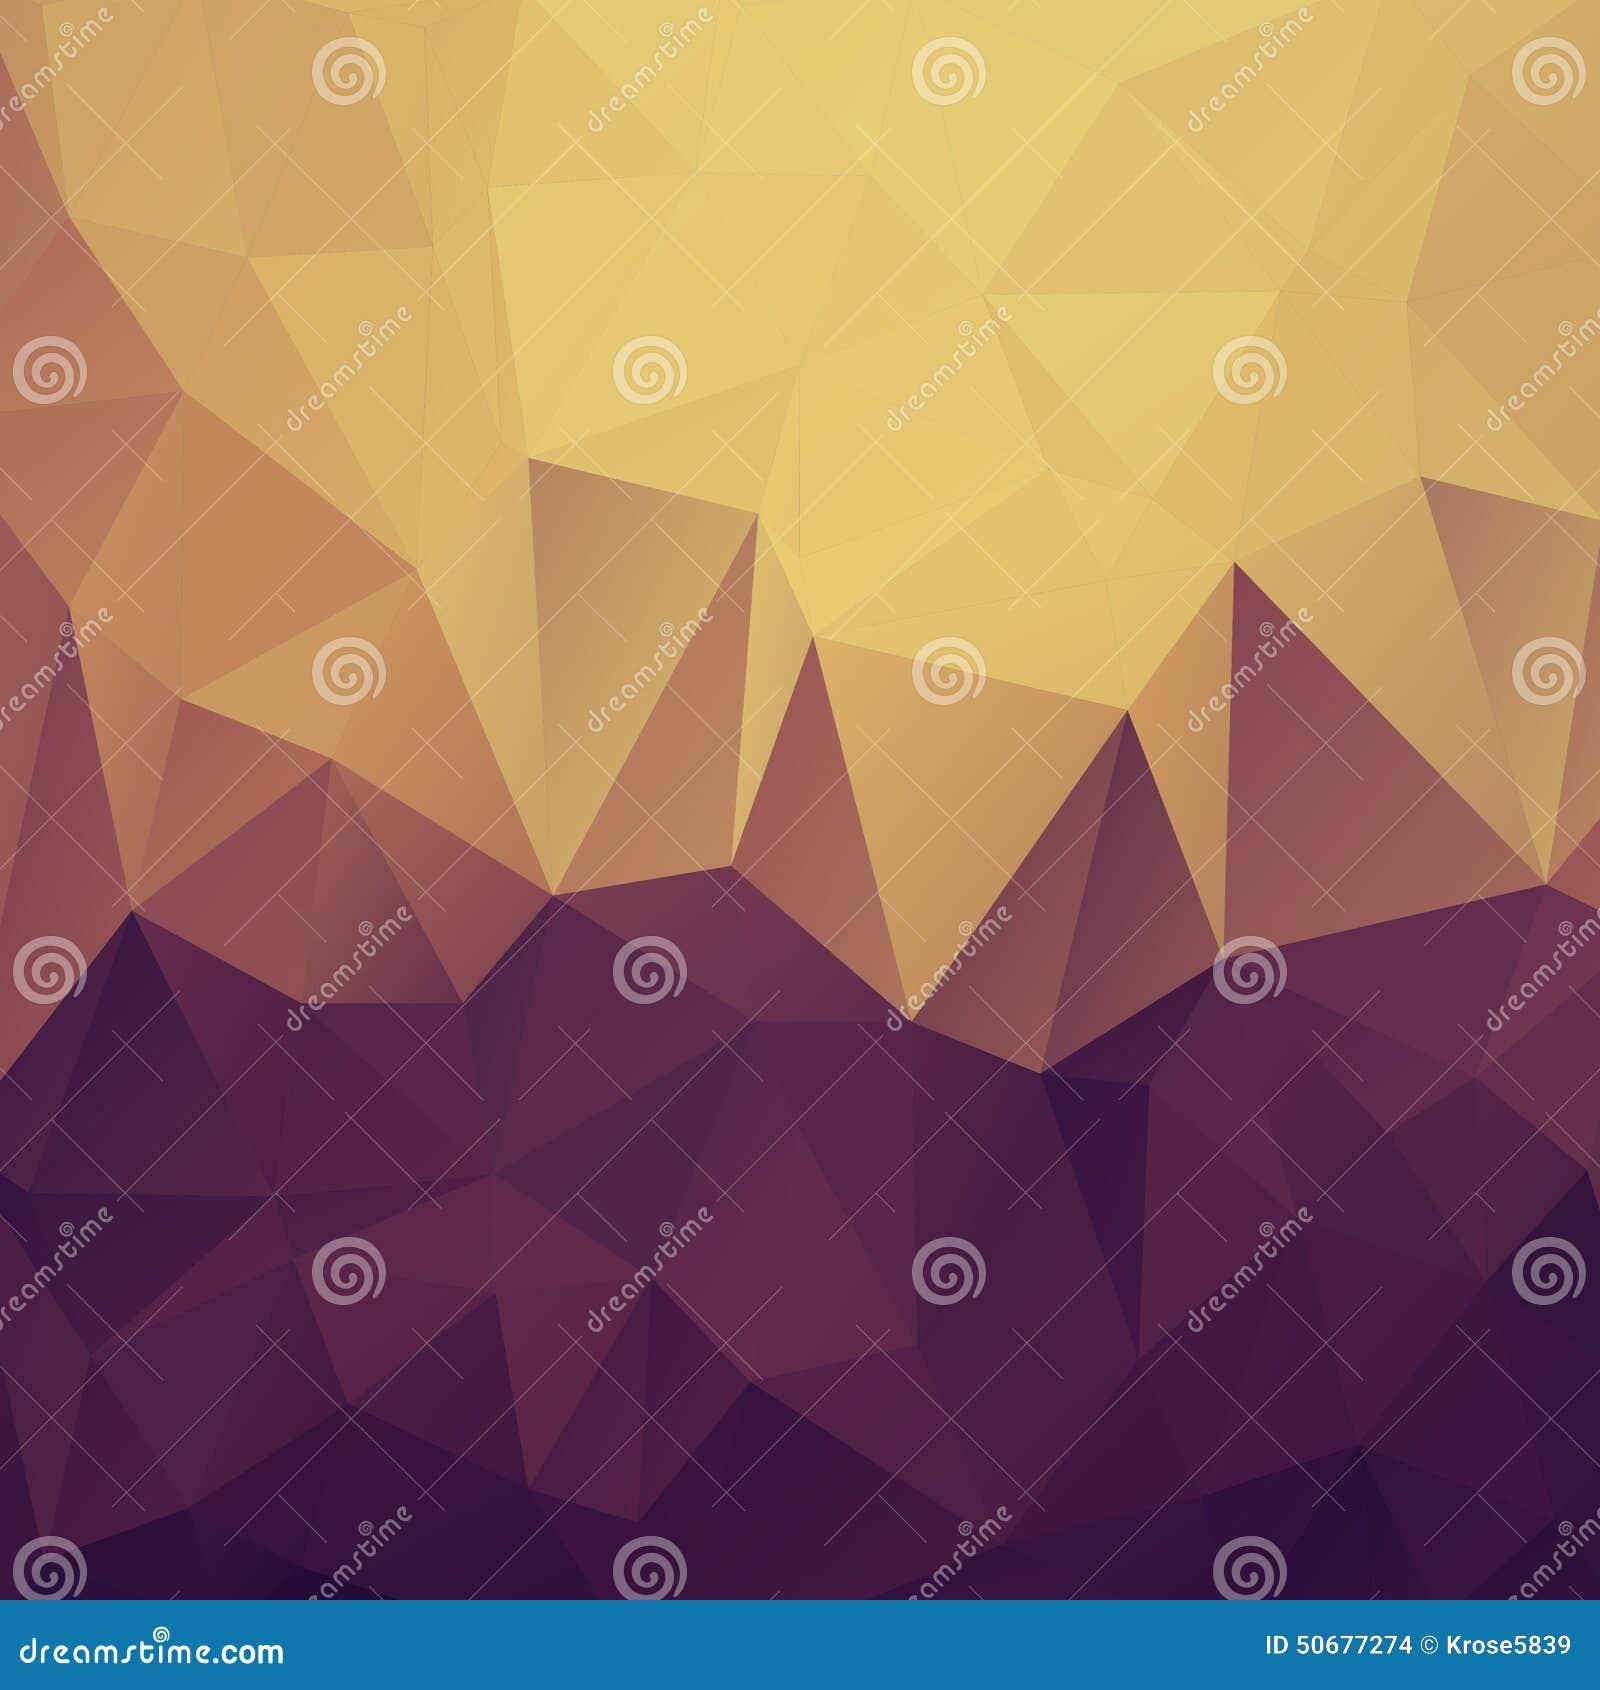 Download 低多彩虹背景 库存照片. 图片 包括有 纸张, 数字式, 紫色, 彩虹, 几何, 淡色, 黄色, 背包, 抽象 - 50677274